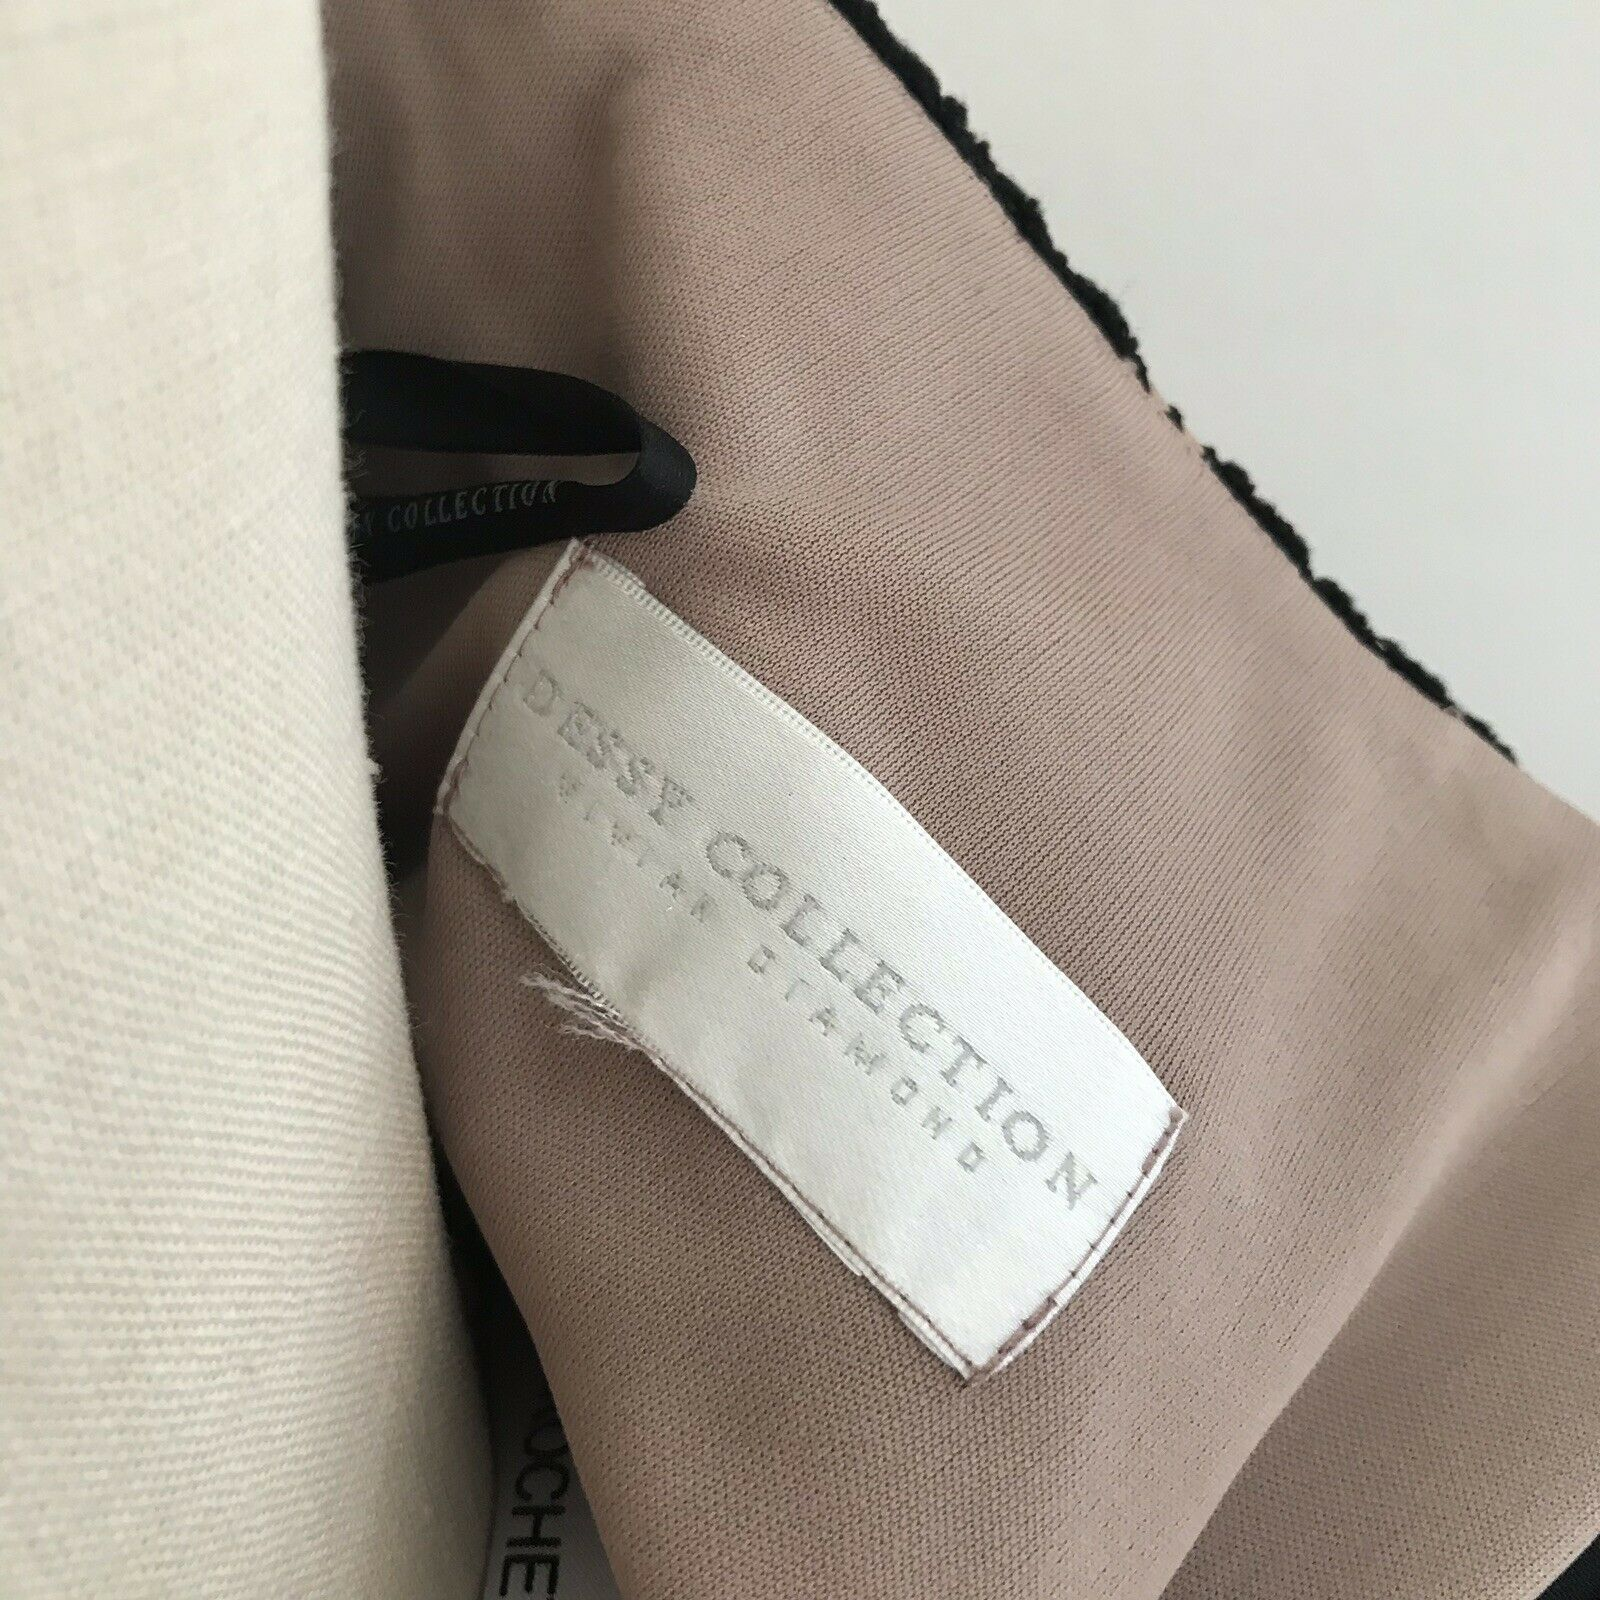 Dessy Collection Gown Black Lace One Shoulder Dre… - image 5